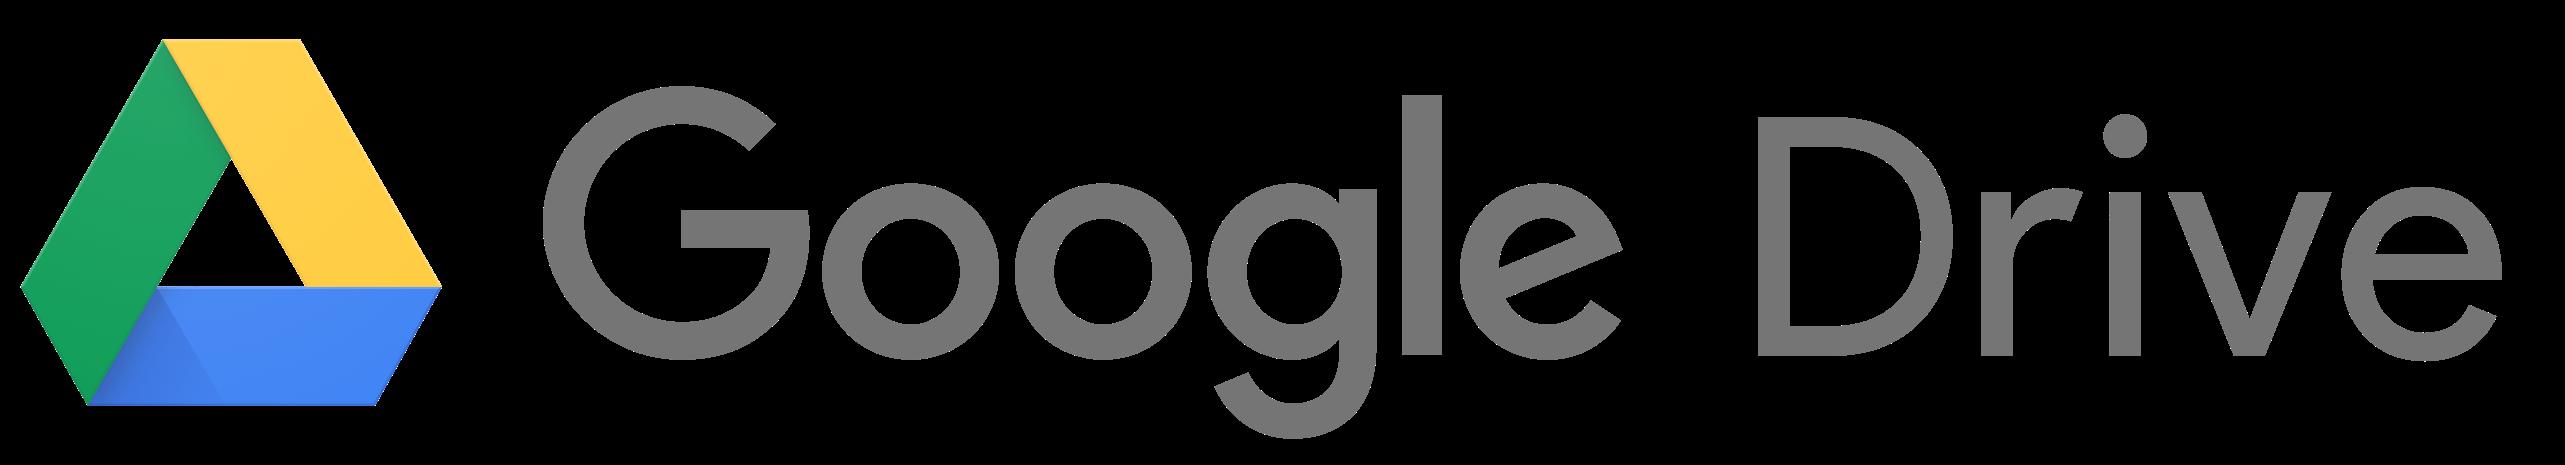 Google Drive Logo and Icon